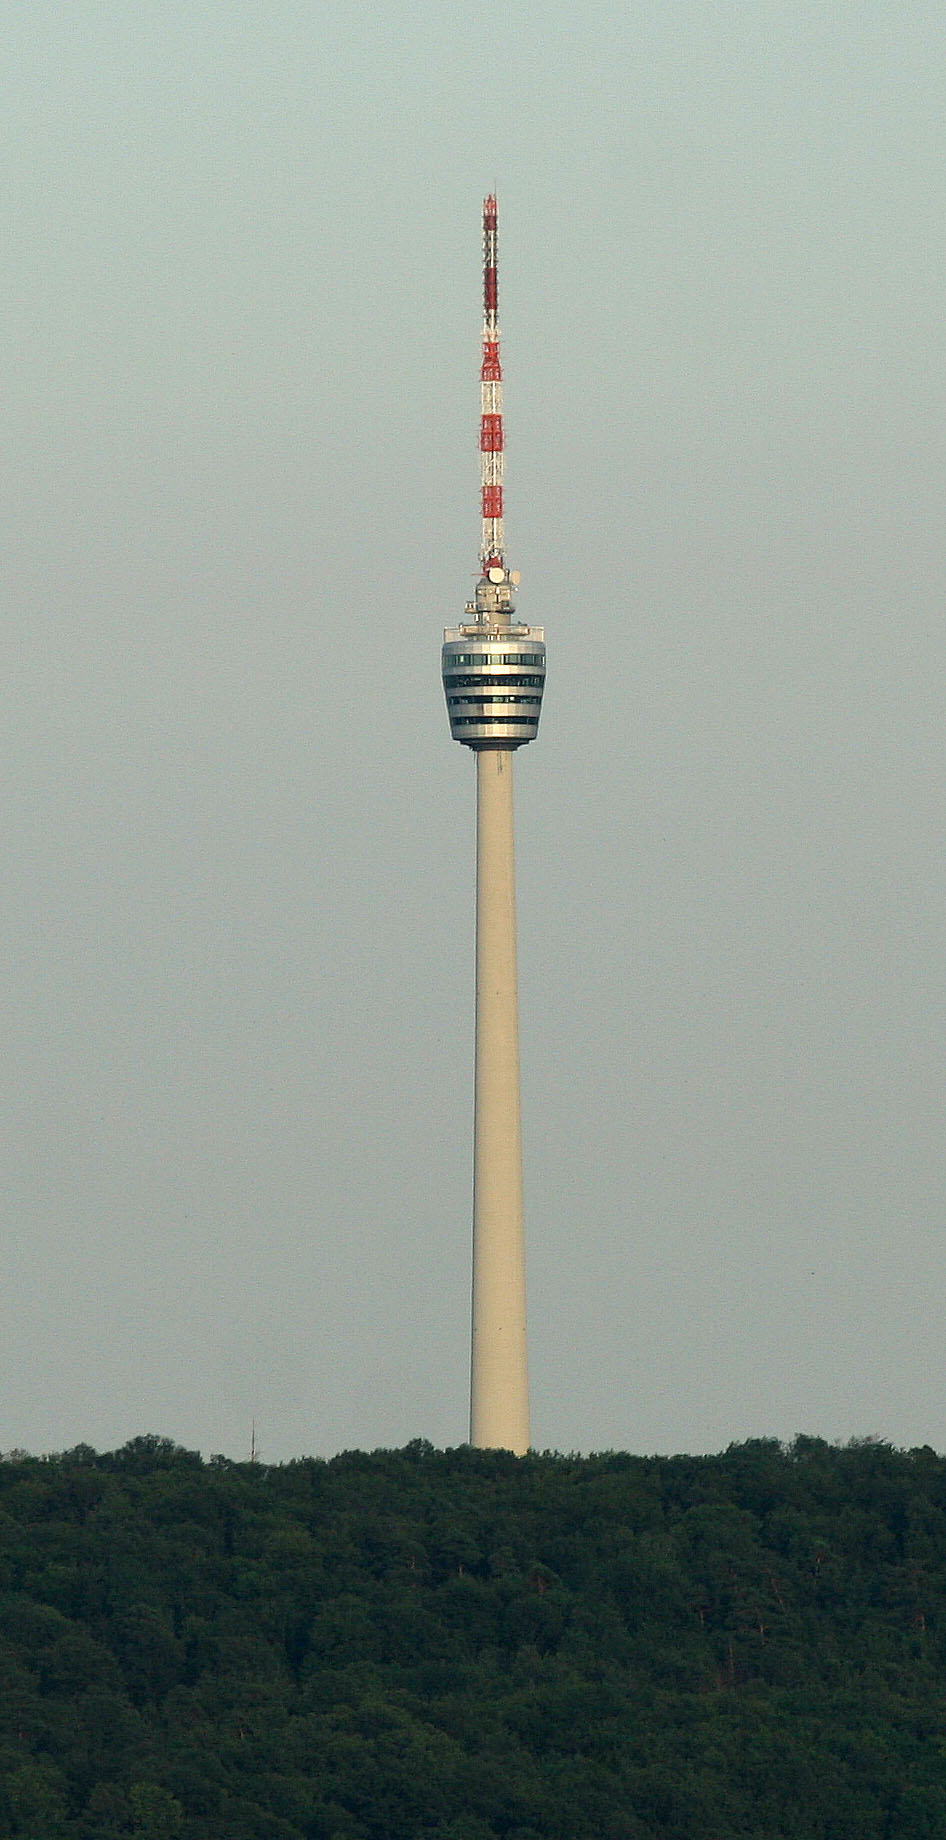 Fernsehturm Stuttgart Eintrittspreis